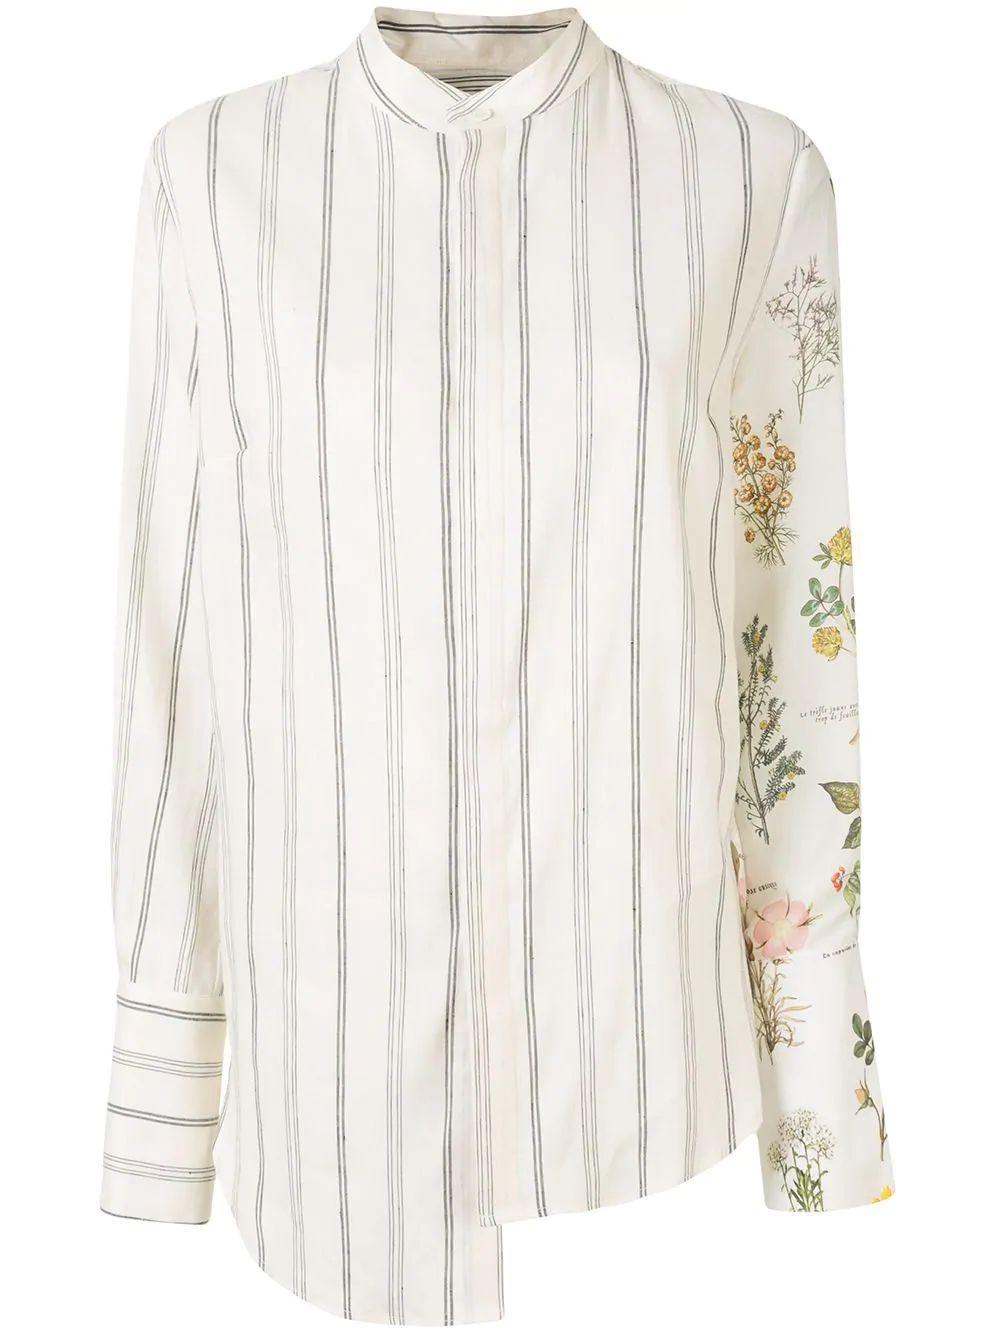 Half Botanical and Stripe Shirt